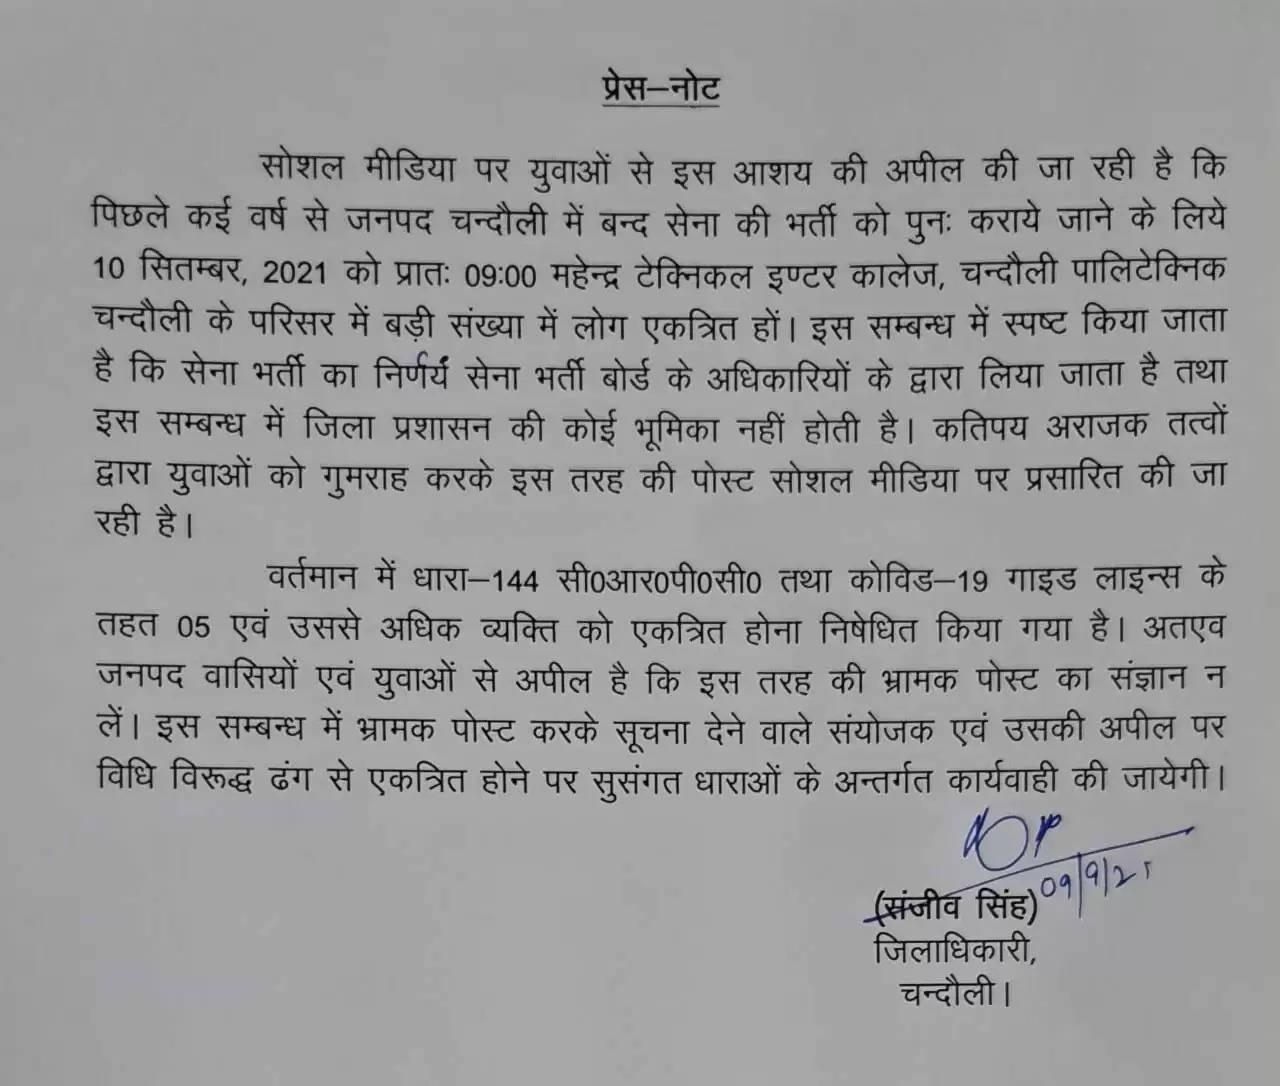 DM Chandauli Warning Letter